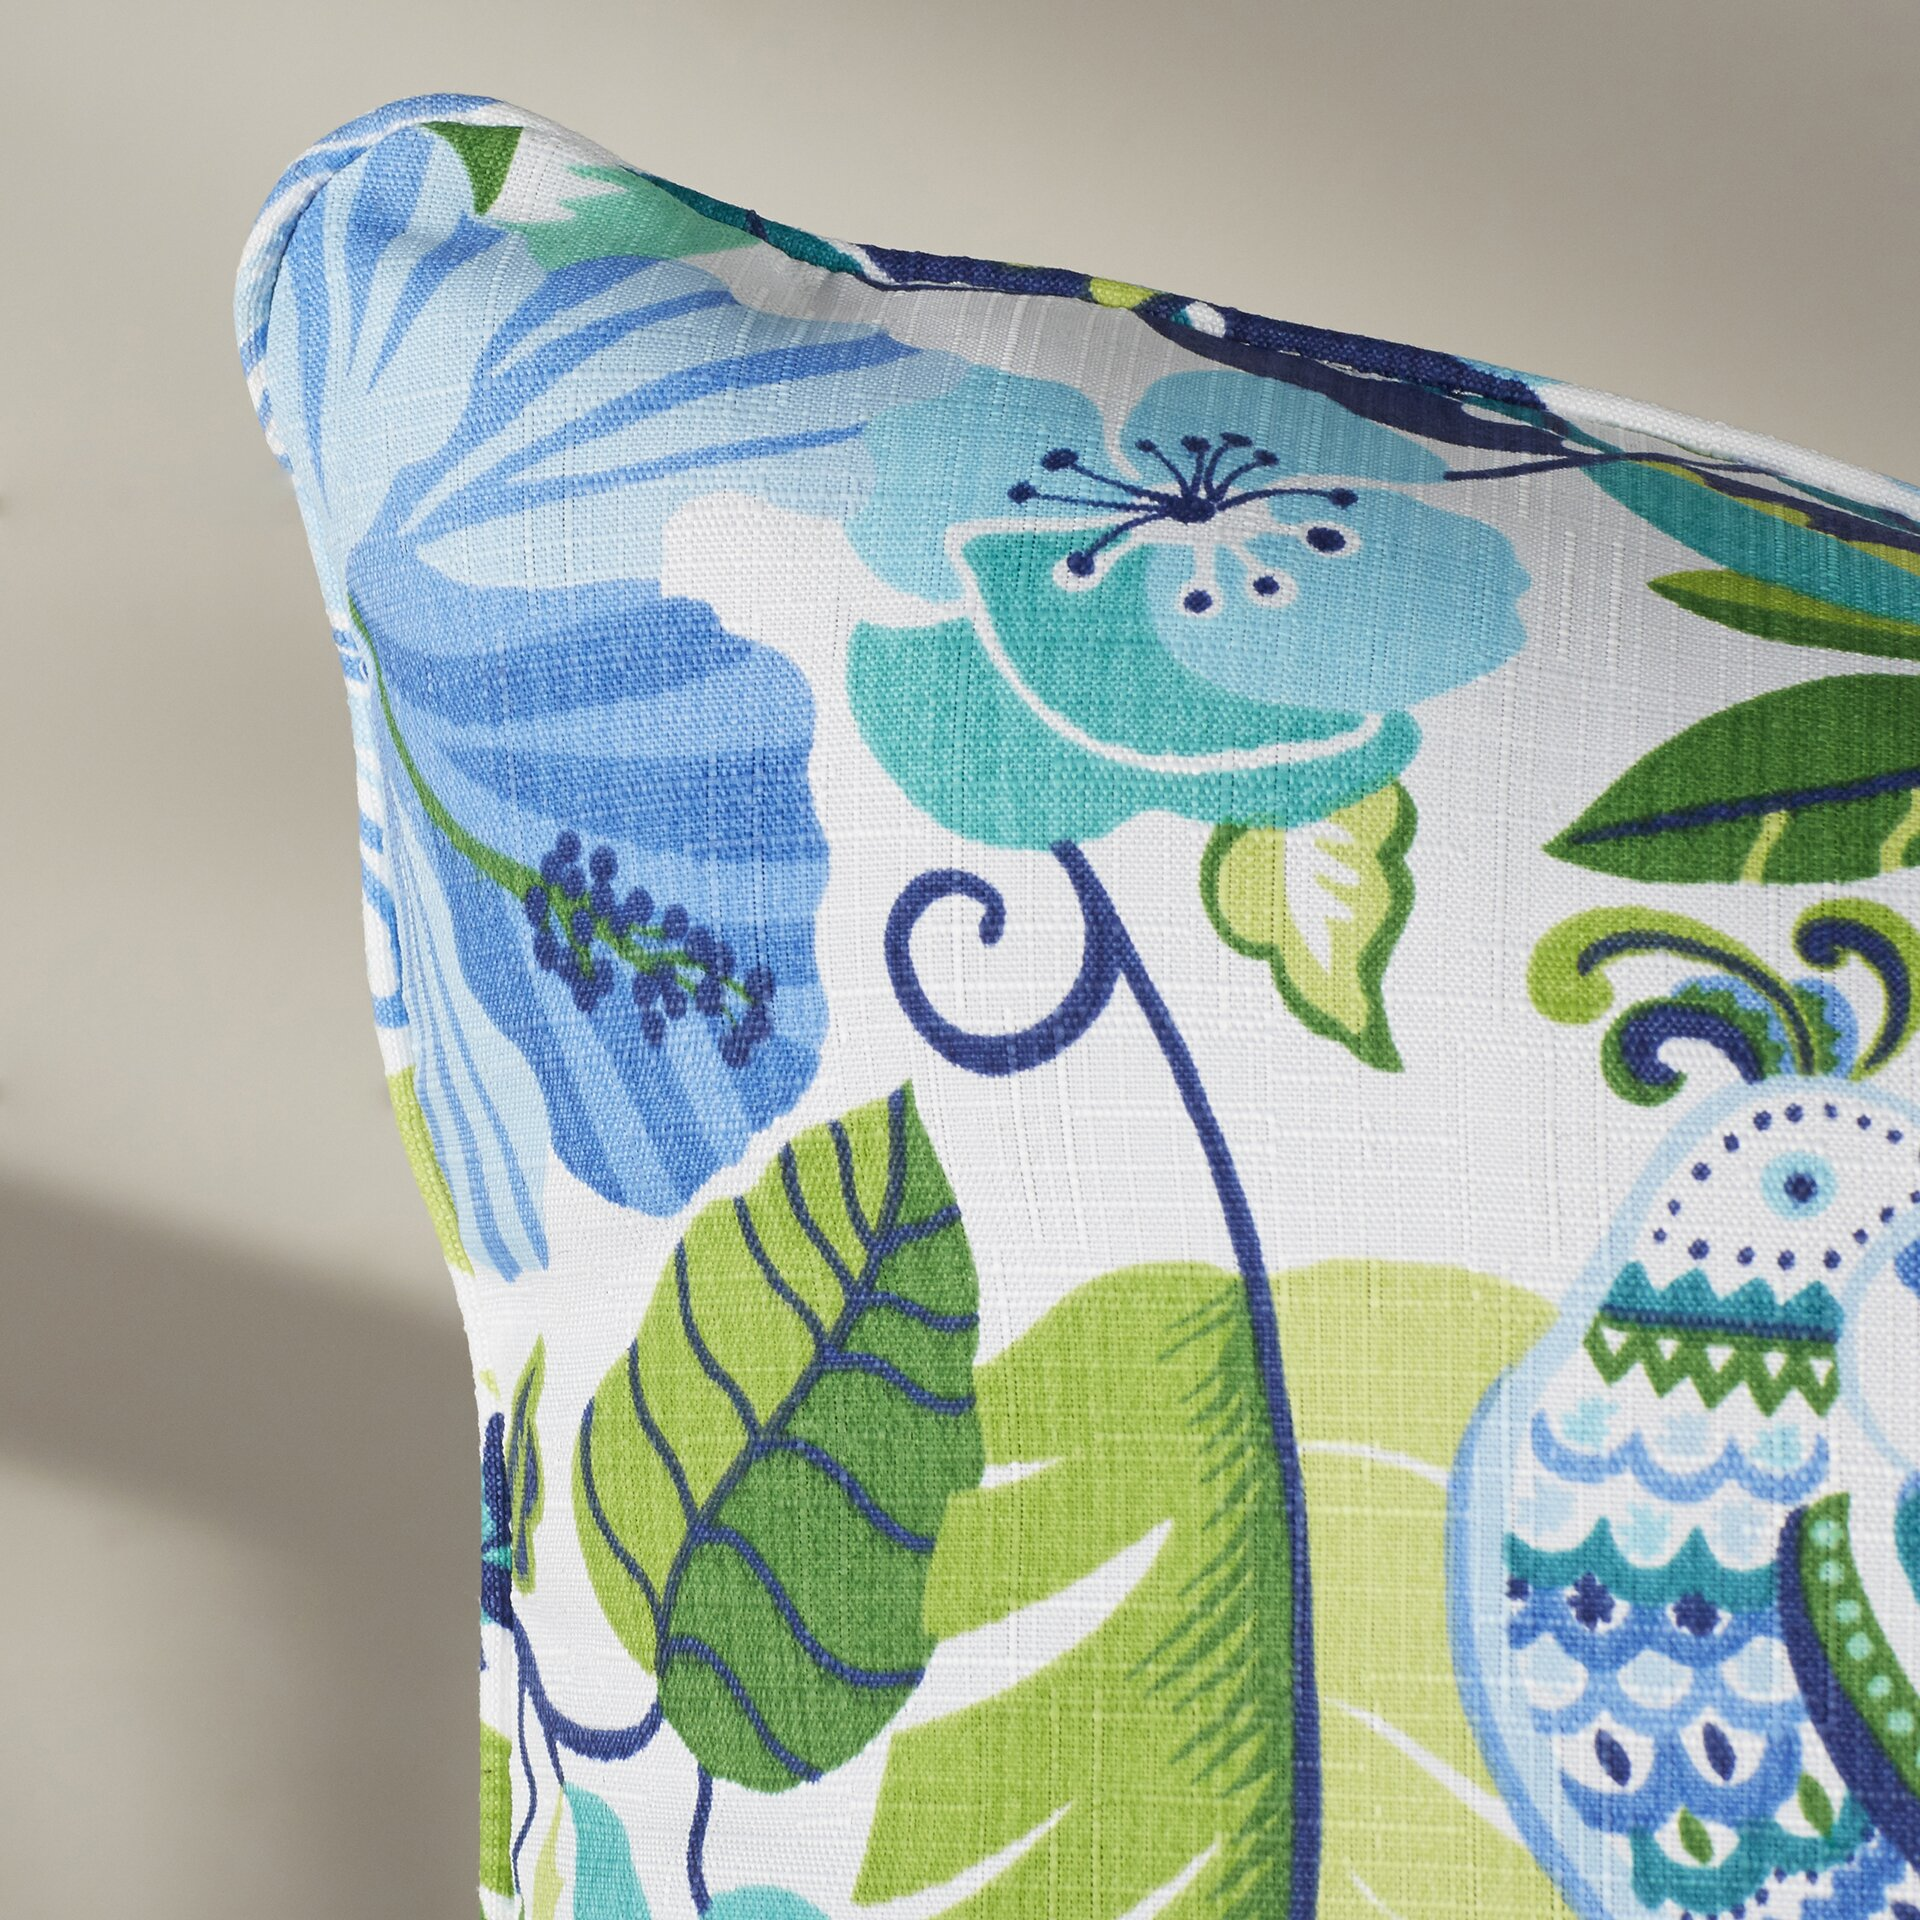 Darby Home Co 2 Piece IndoorOutdoor Chair Cushion Set Reviews – 2 Piece Outdoor Chair Cushions